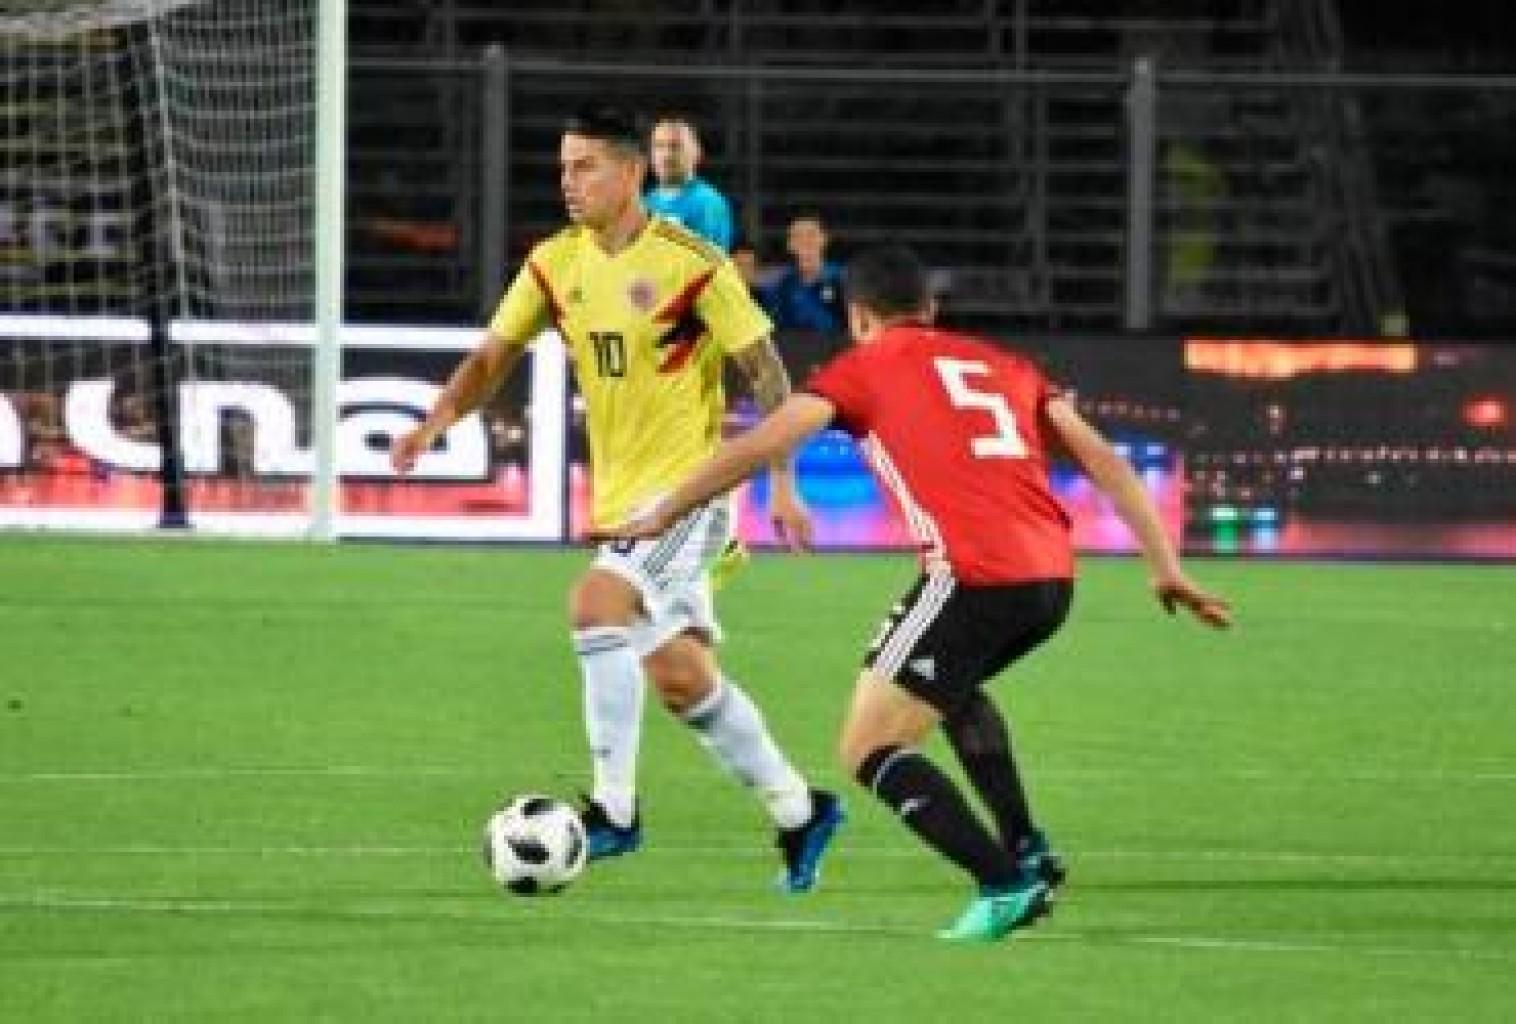 Colombia con dudas luego de empatar ante Egipto en un compromiso amistoso